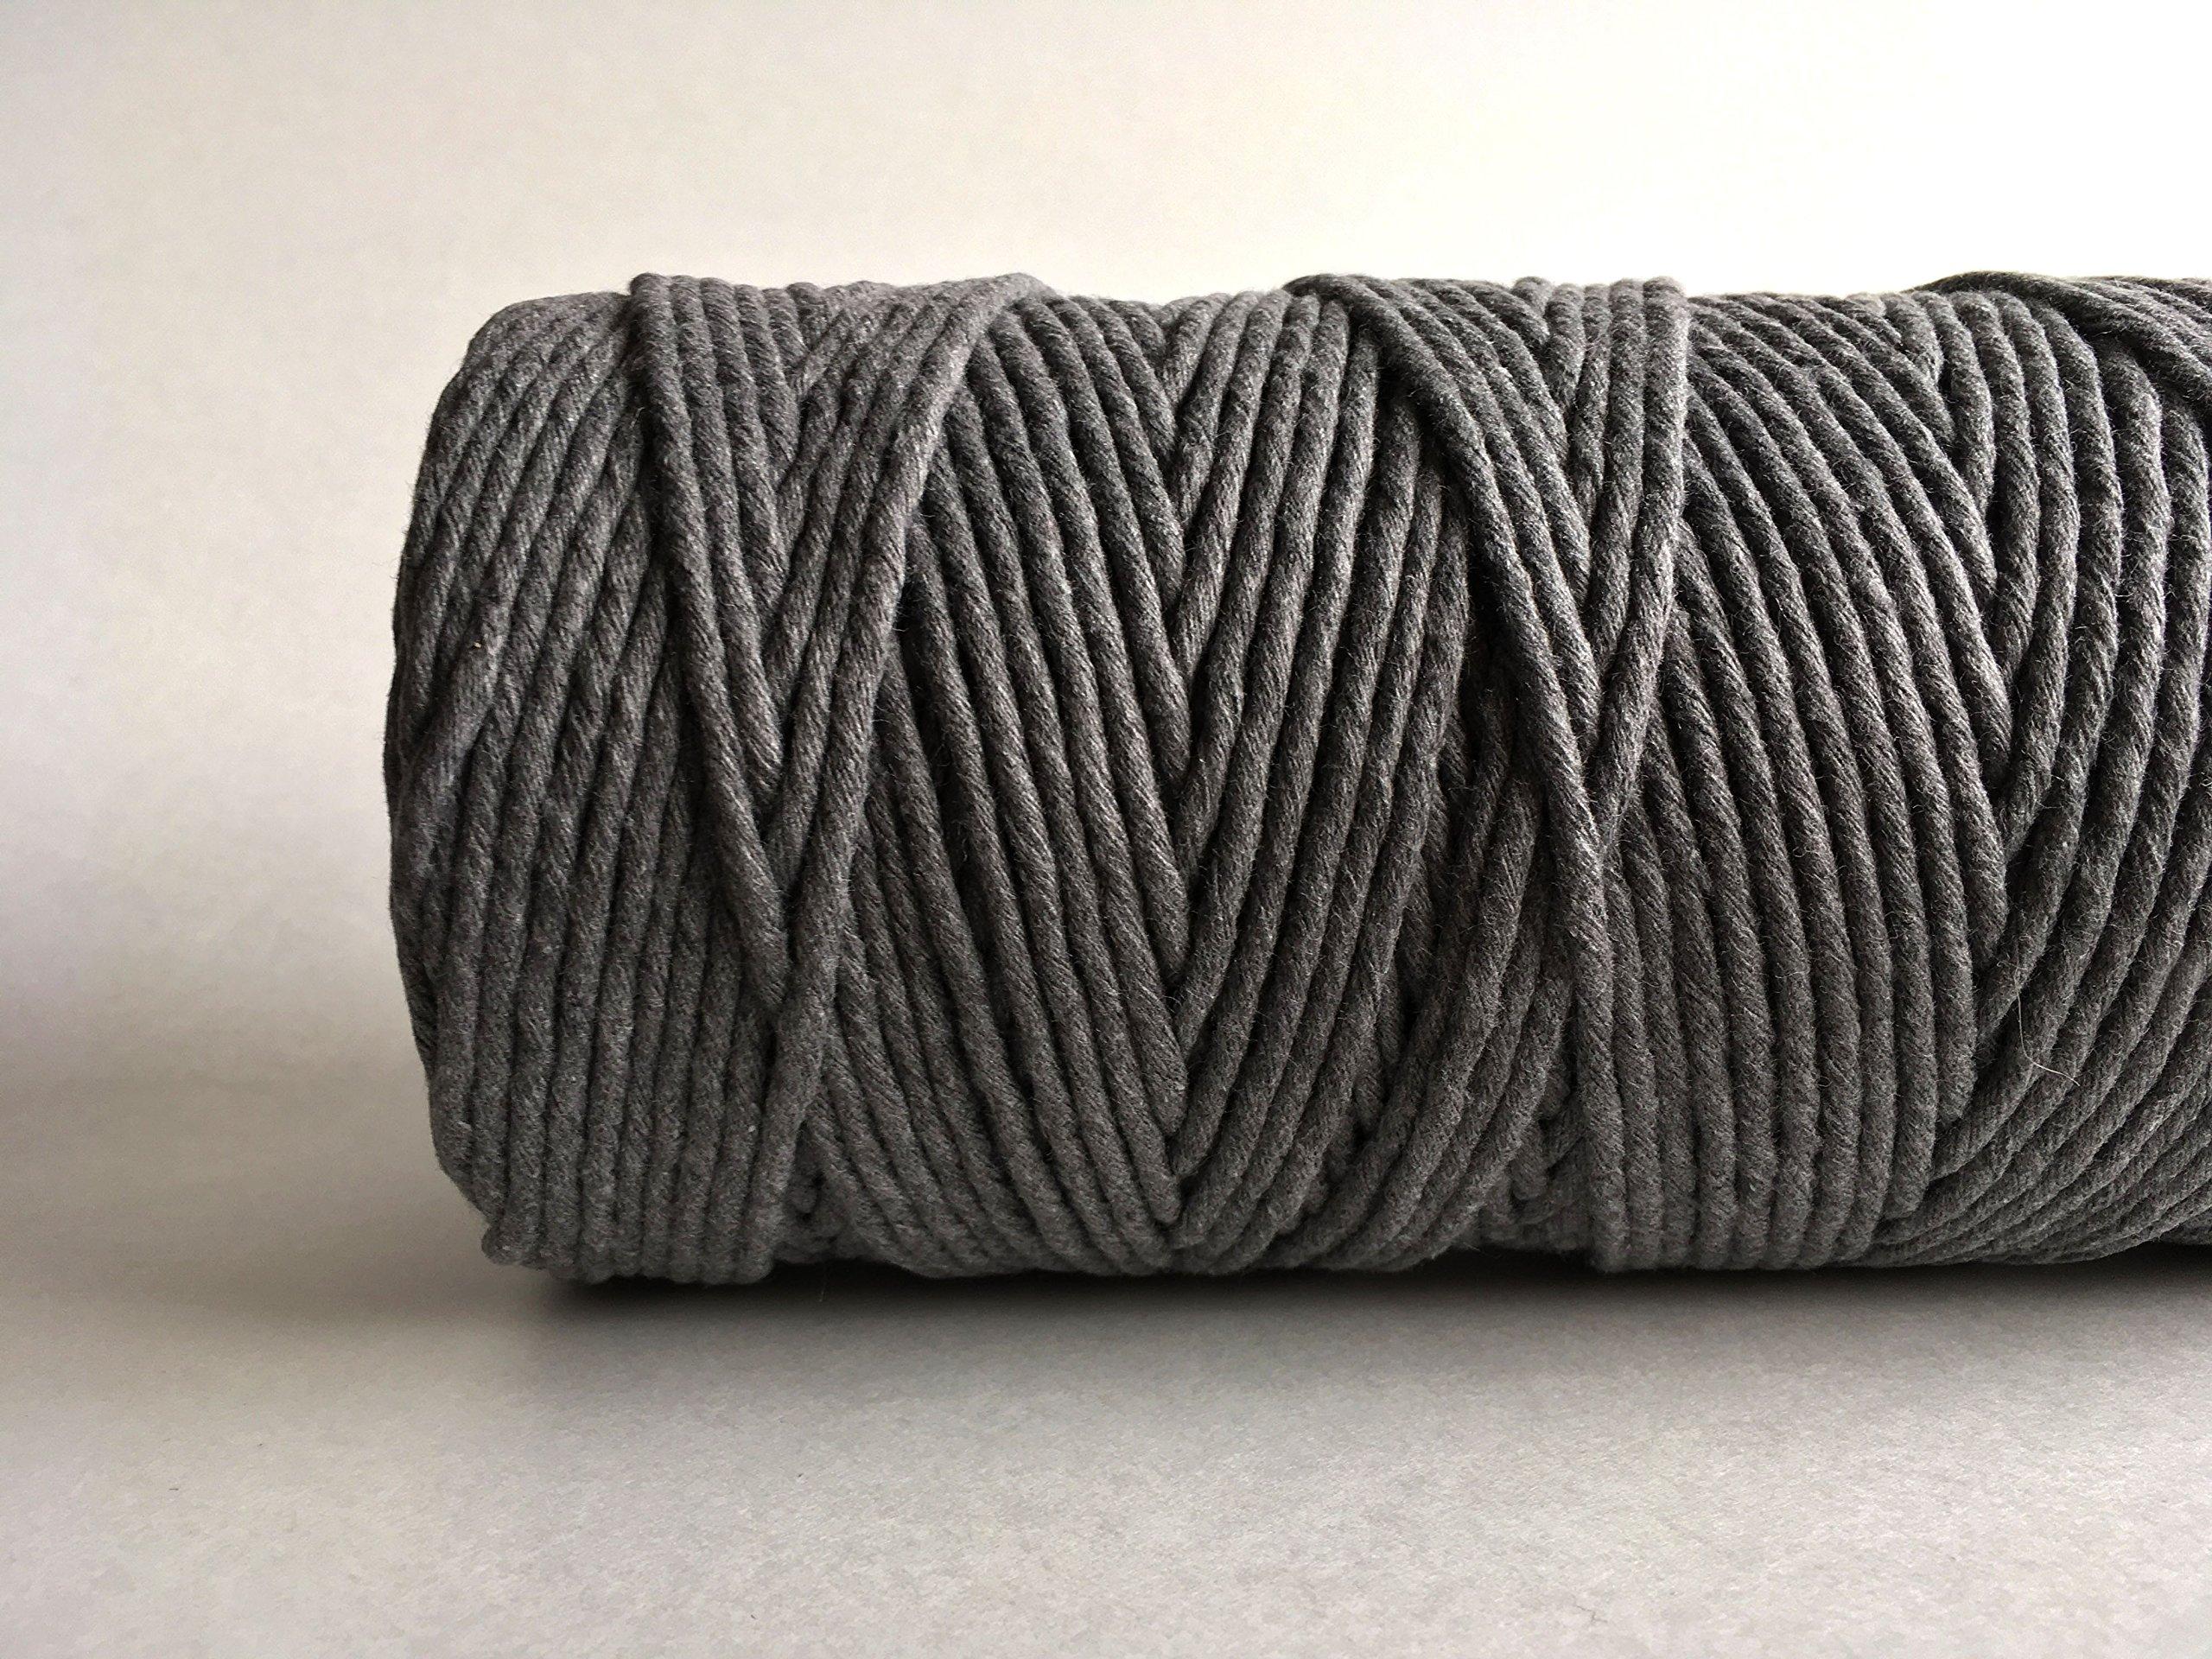 Gray Macrame Cord / 4mm Single Strand Cotton Fiber Art Rope/Earl Gray/Charcoal by Rock Mountain Co (Image #2)